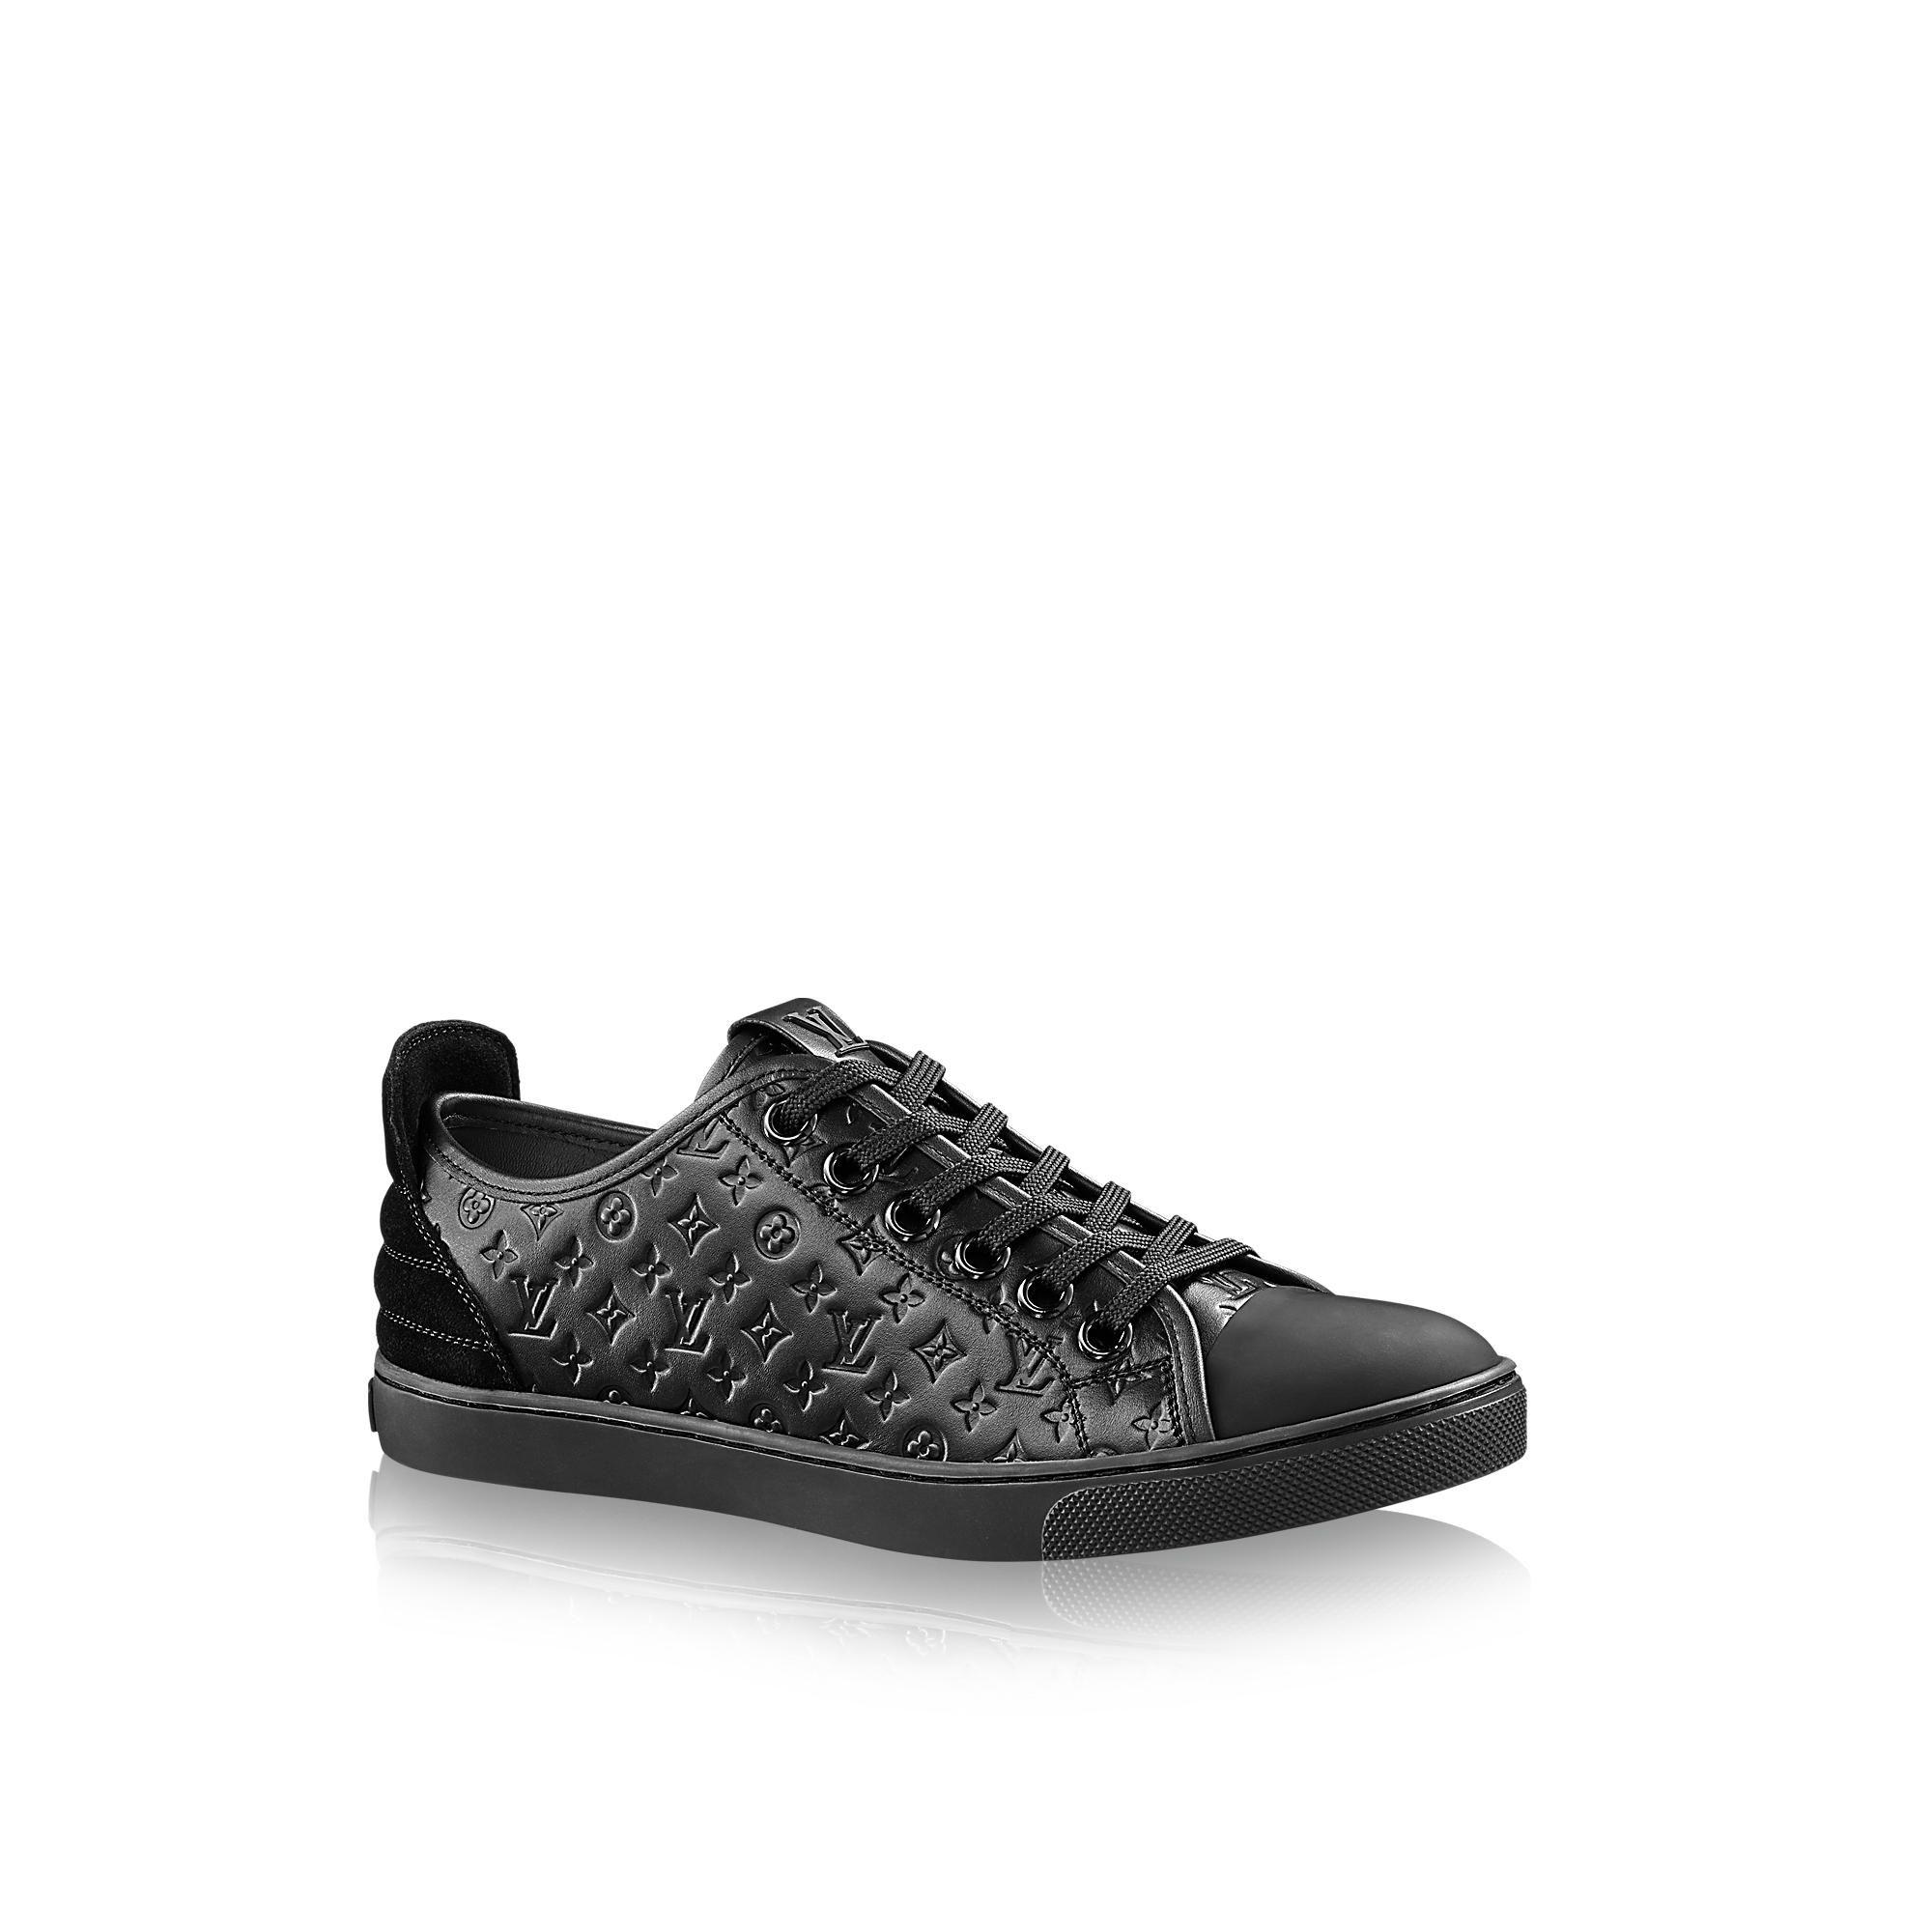 Louis Vuitton Sneakers Womens